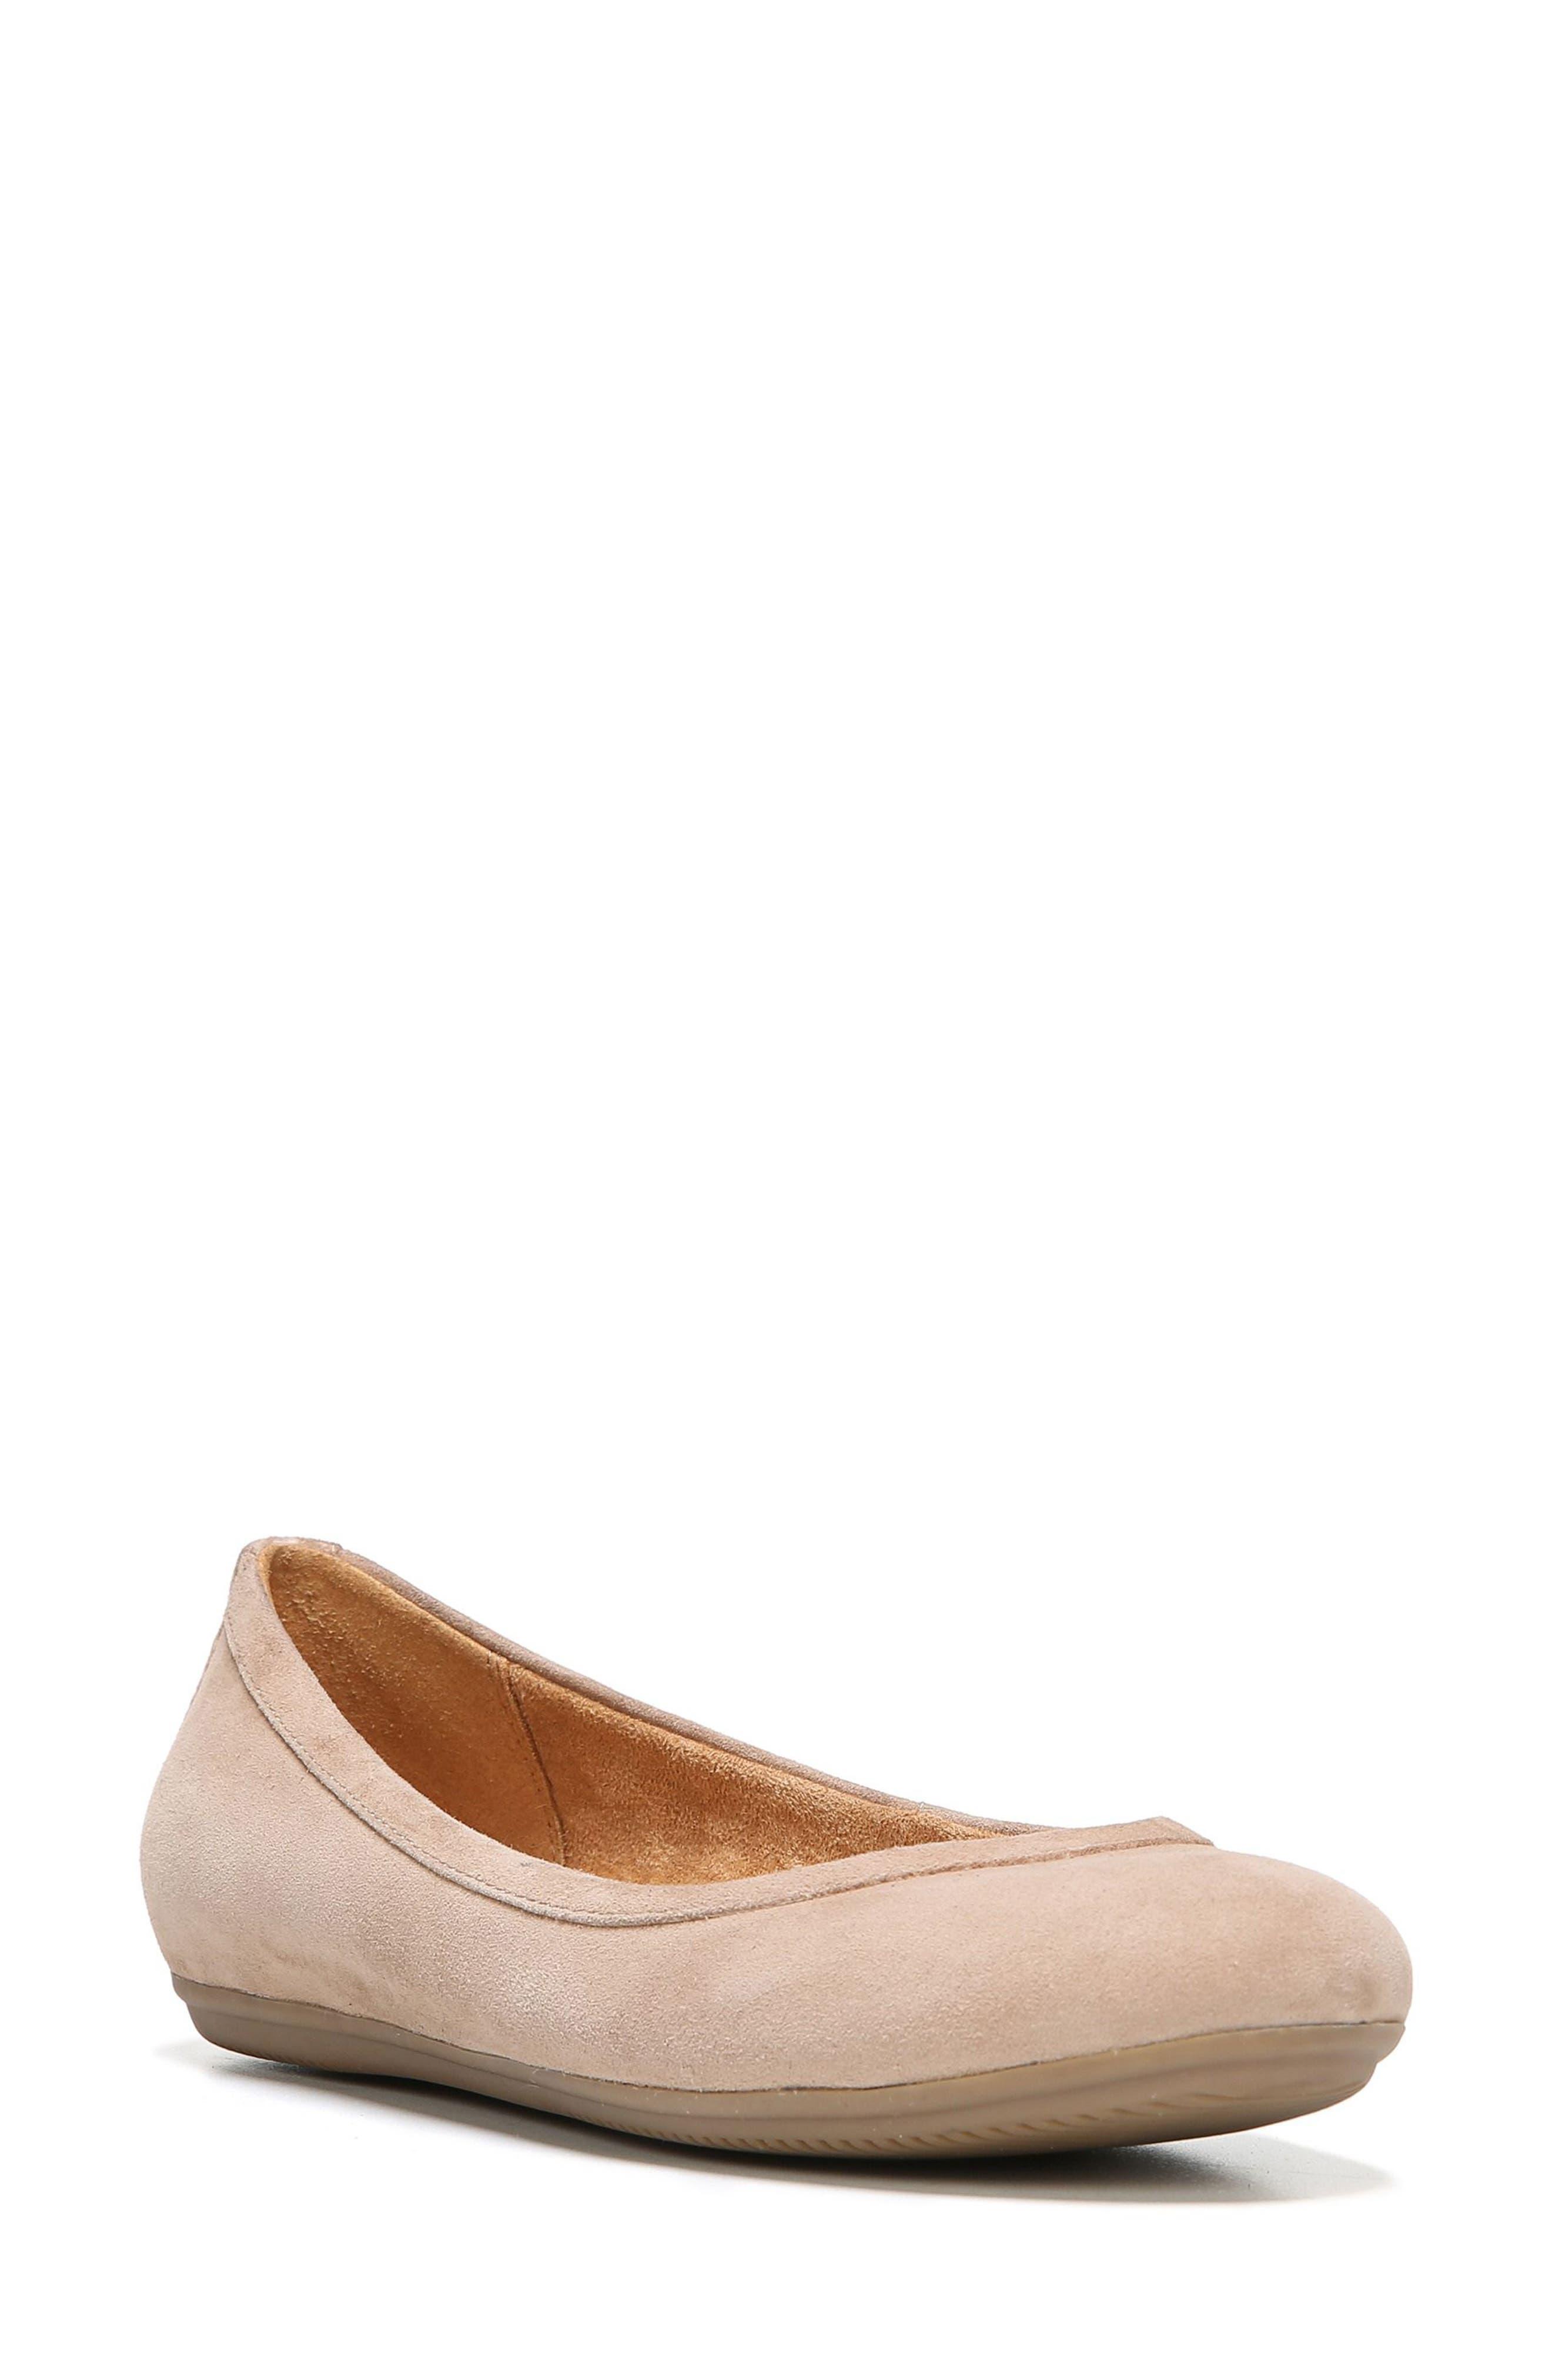 Brittany Ballet Flat,                             Main thumbnail 9, color,